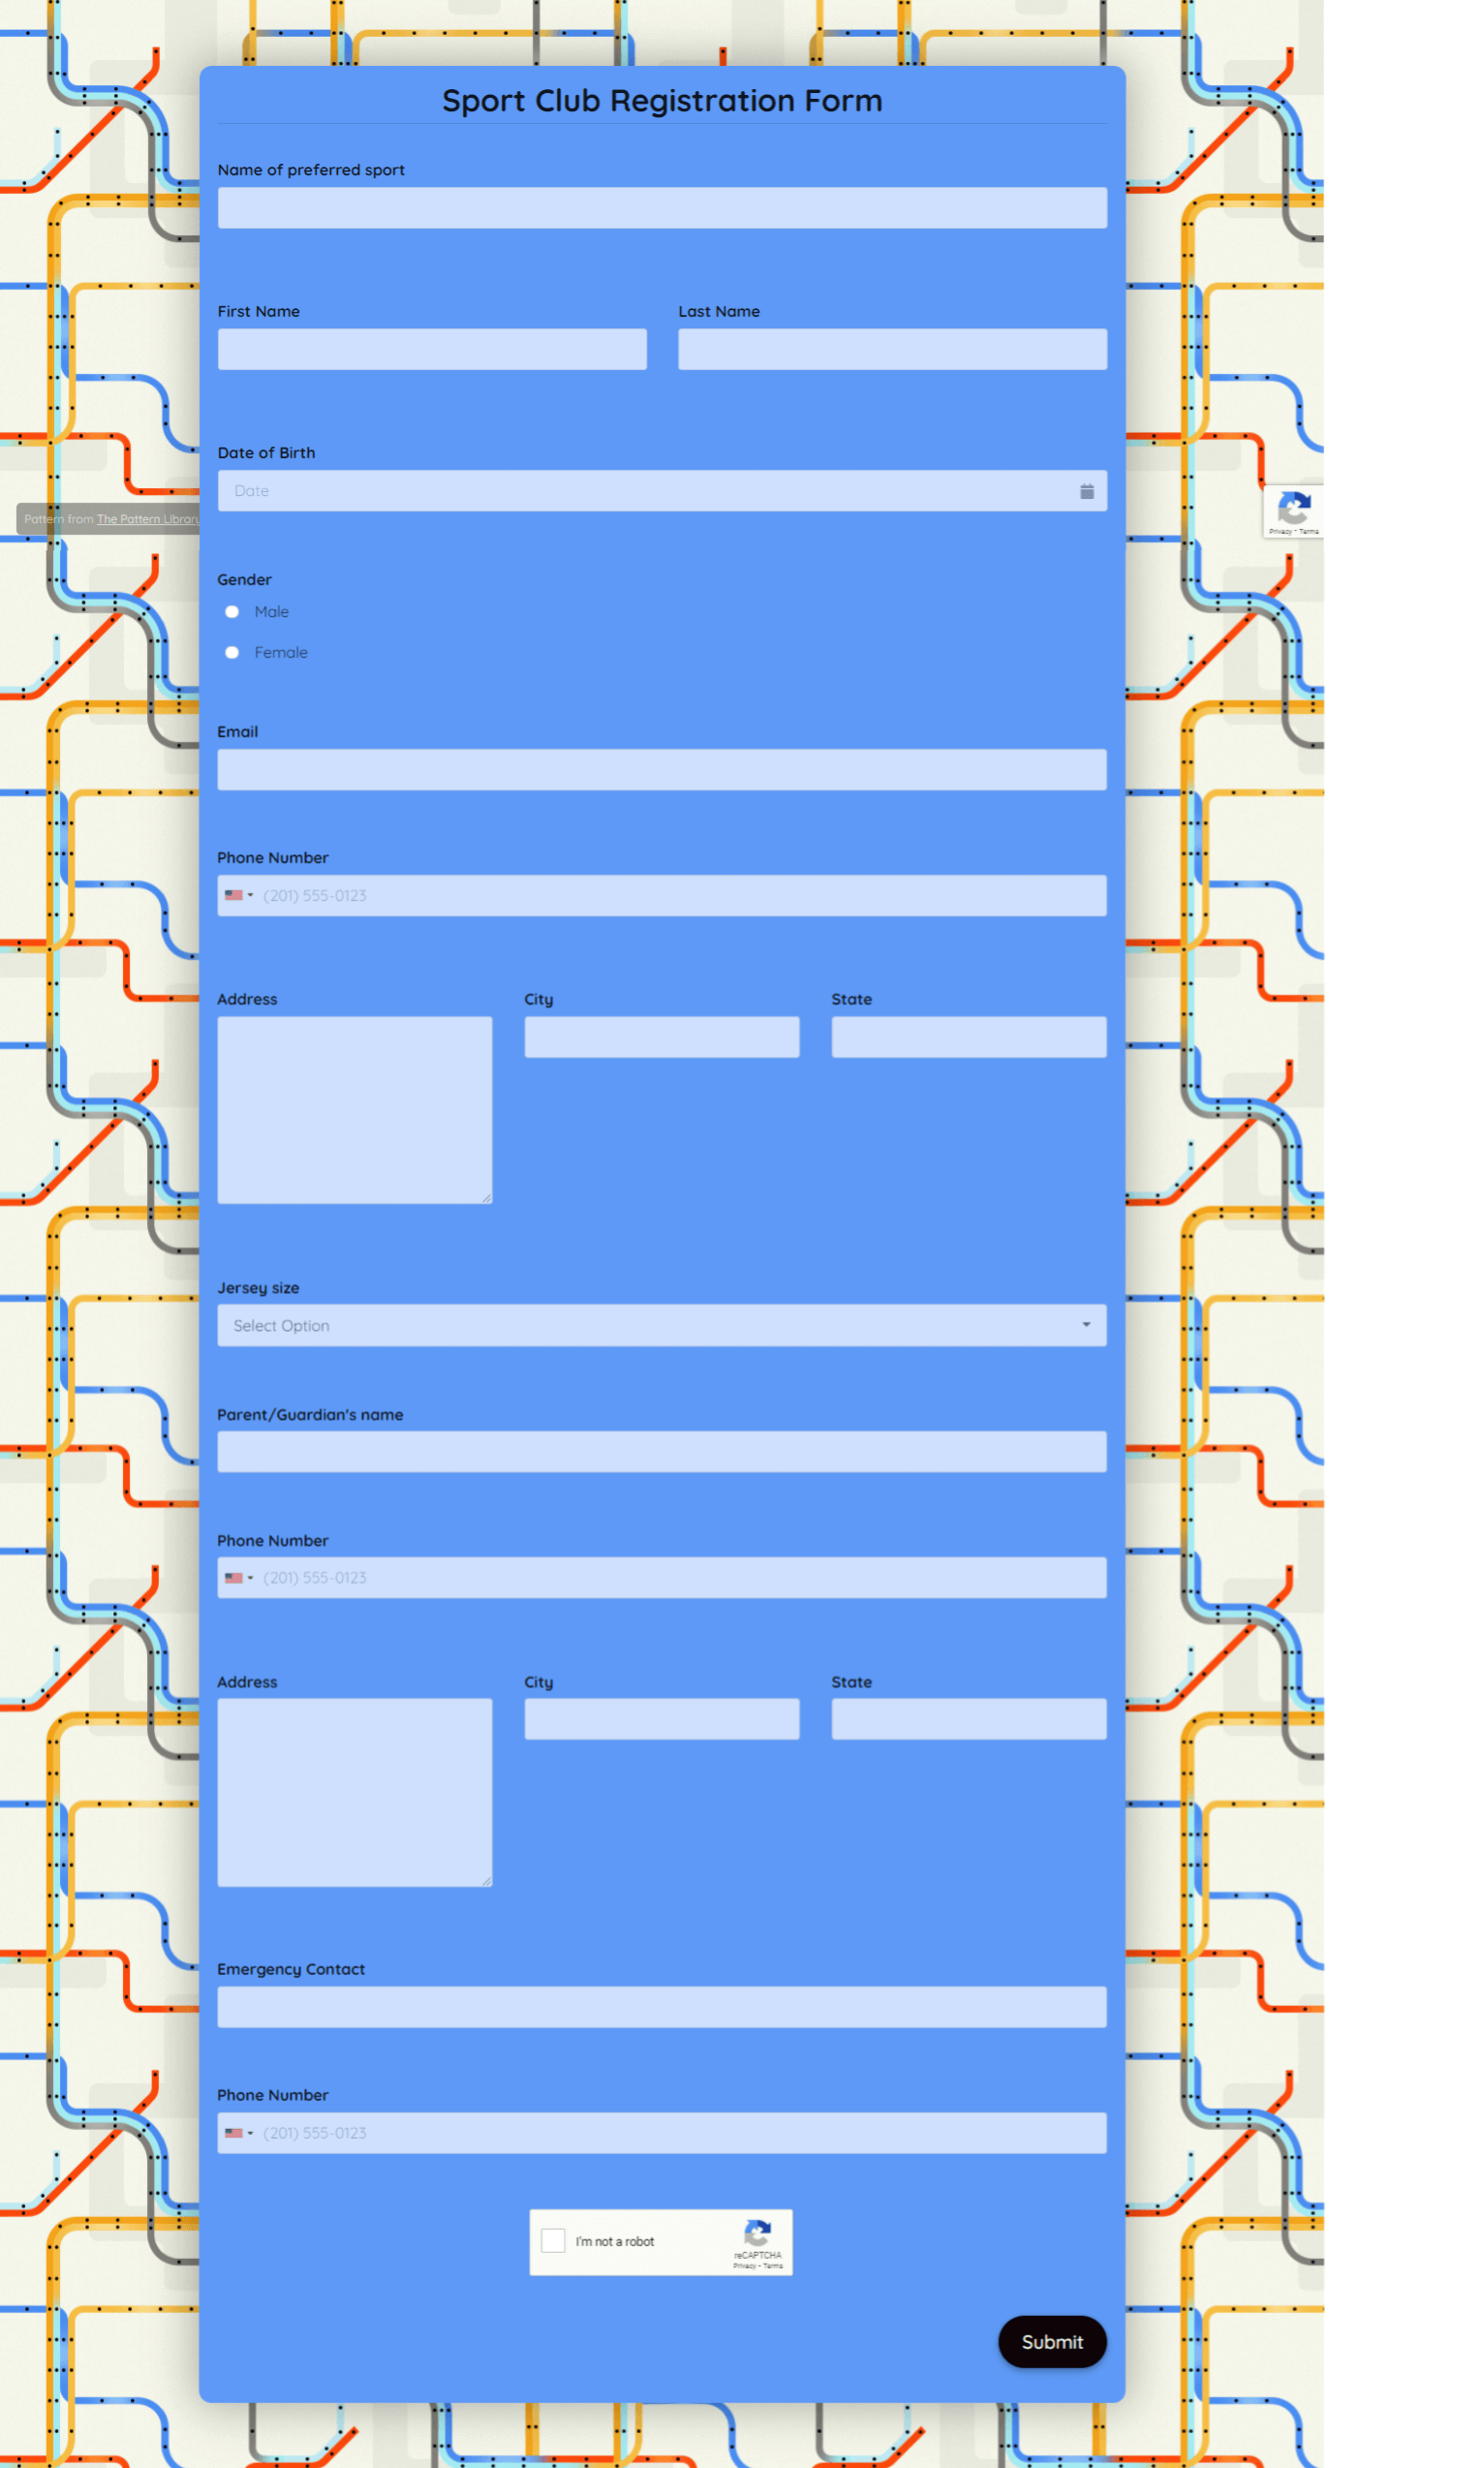 Sport Club Registration Form Template template